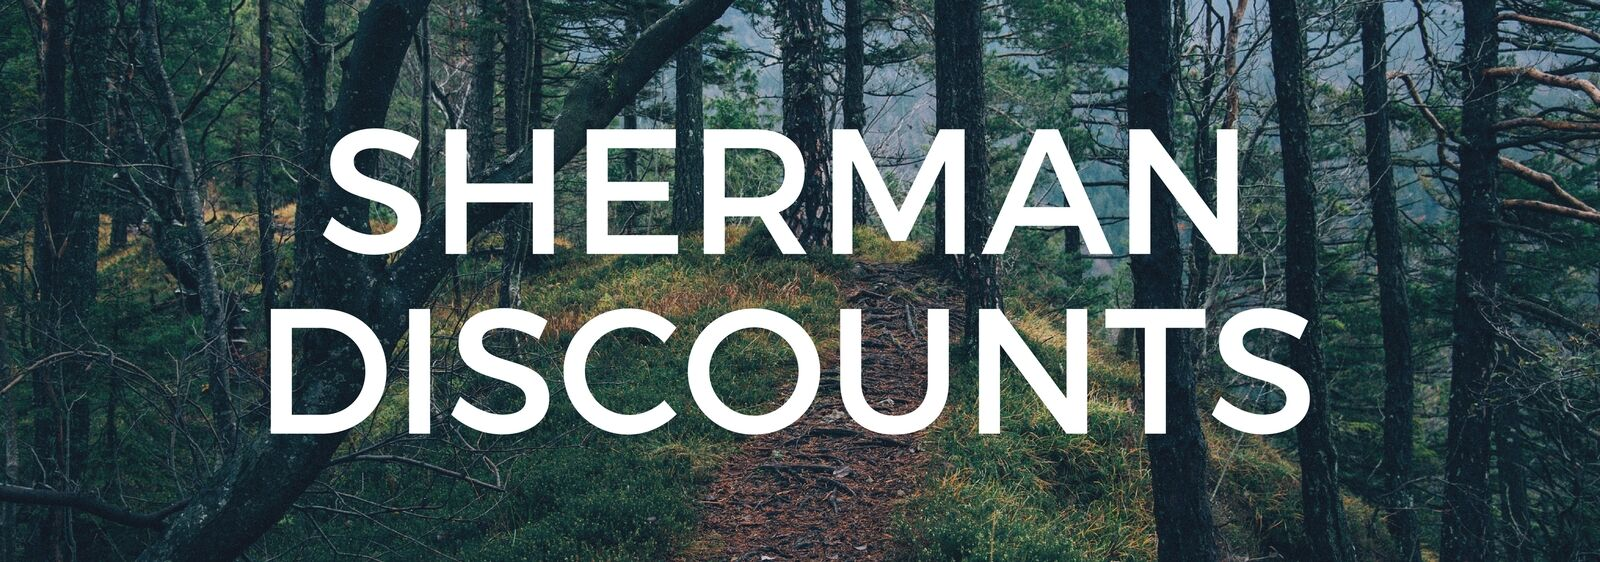 shermandiscounts